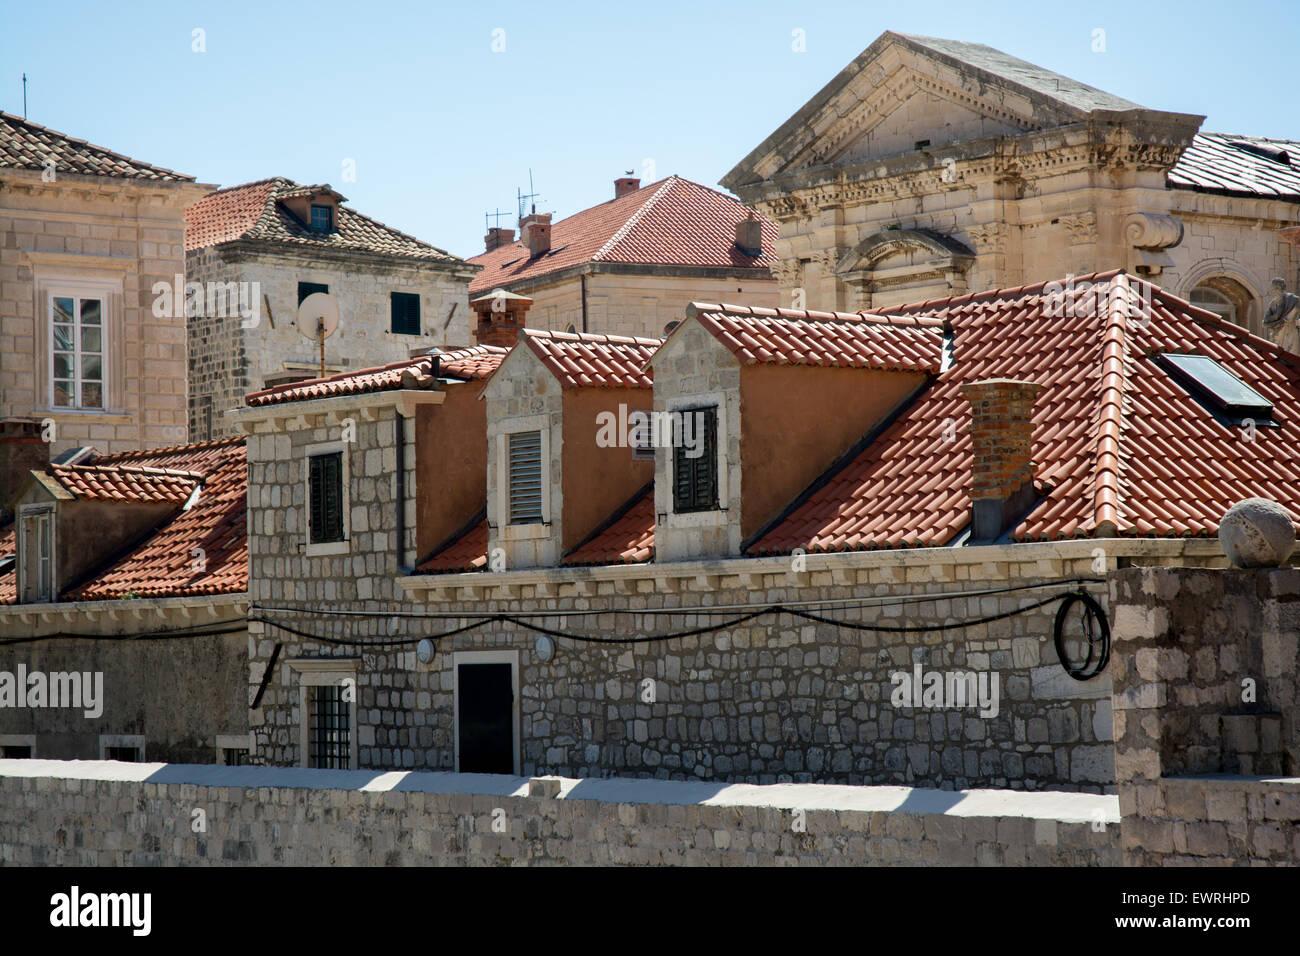 buidings in old city, dubrovnik, croatia - Stock Image